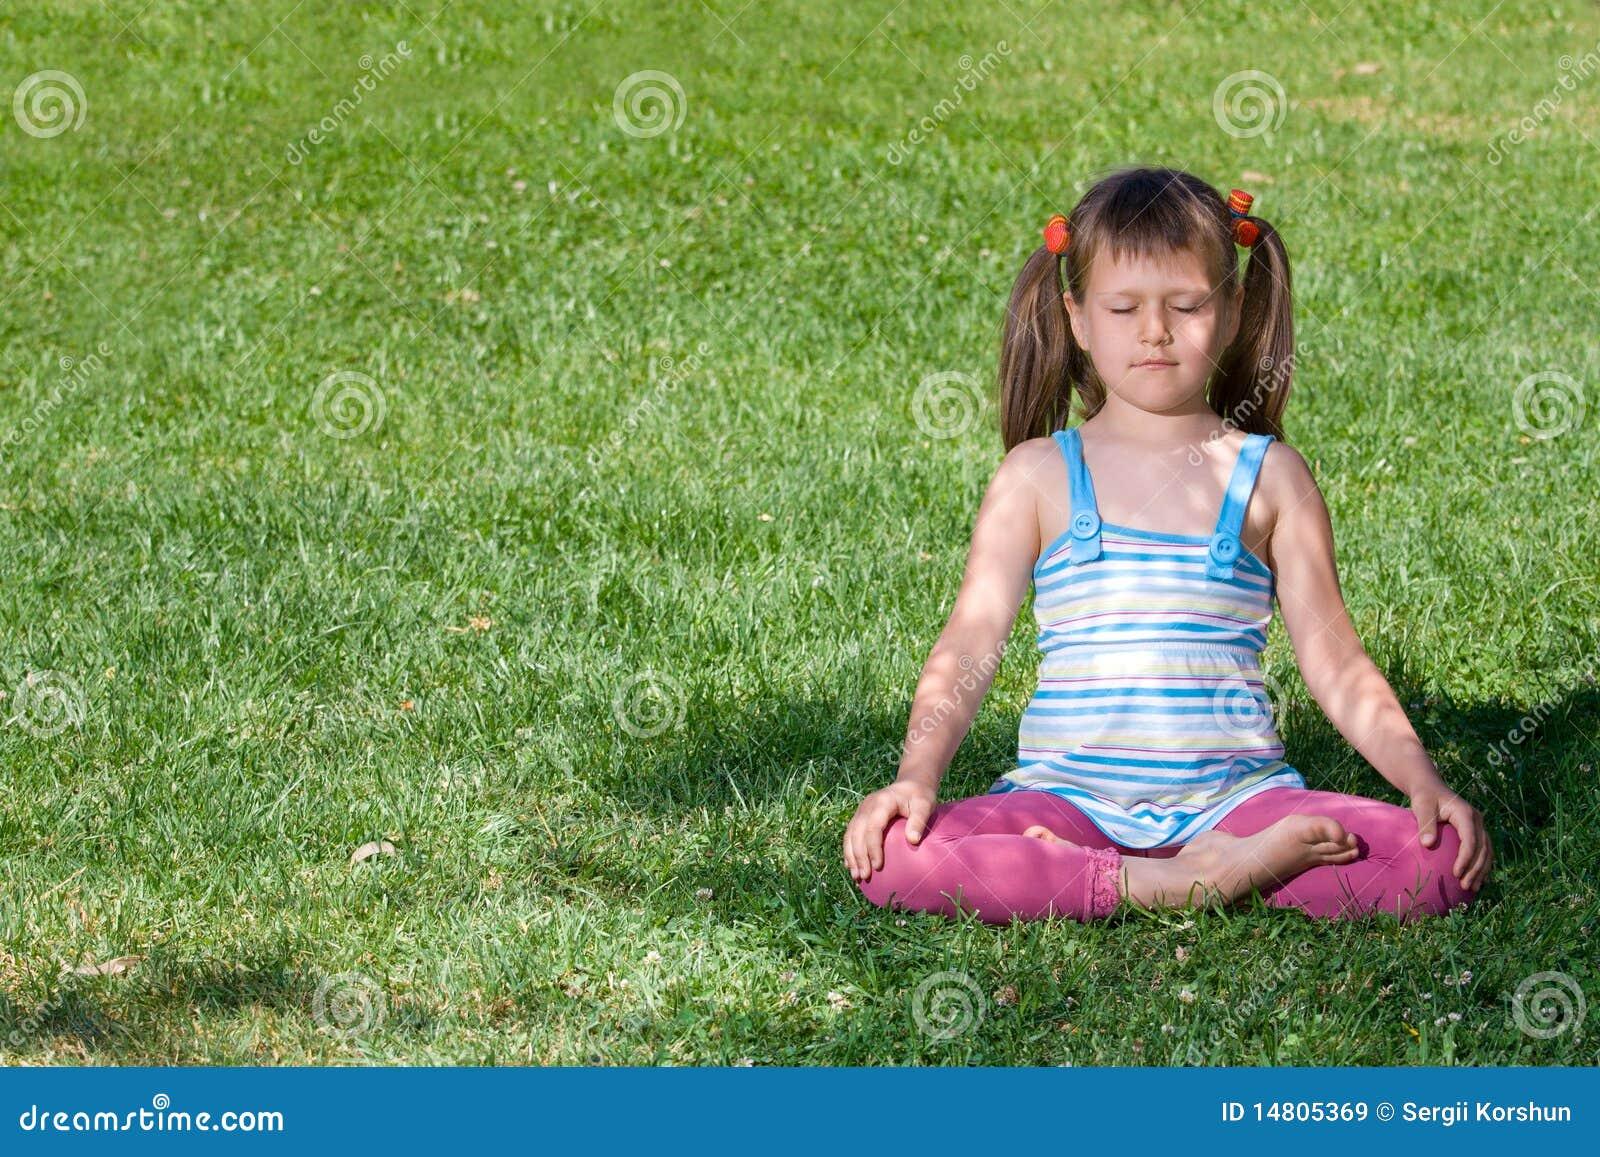 Little child meditate in asana on green grass